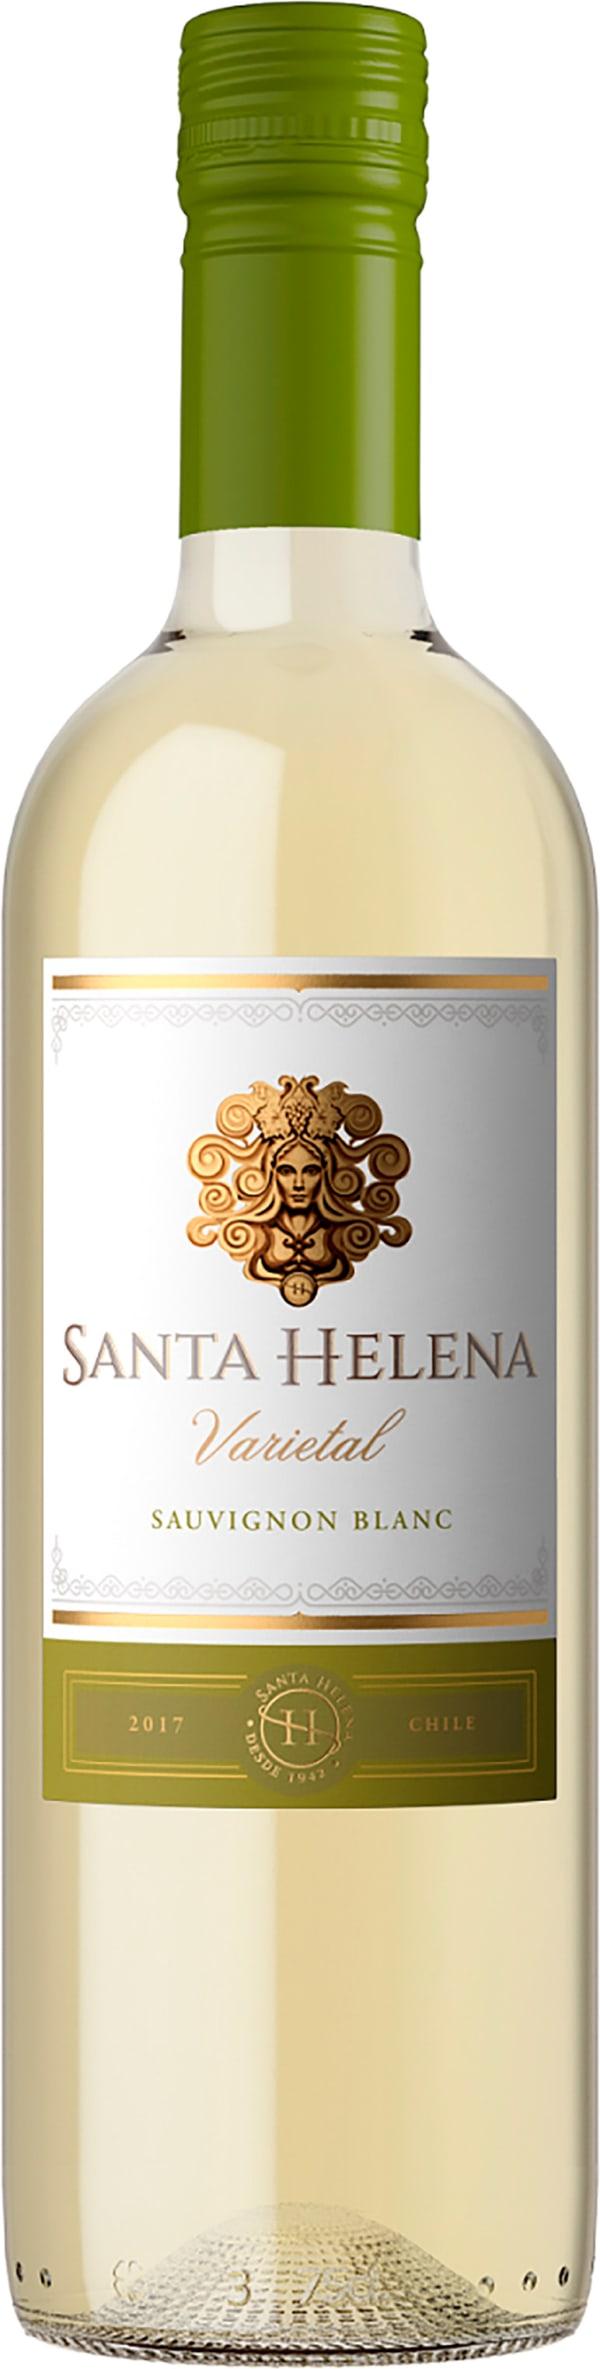 Santa Helena Varietal Sauvignon Blanc 2018